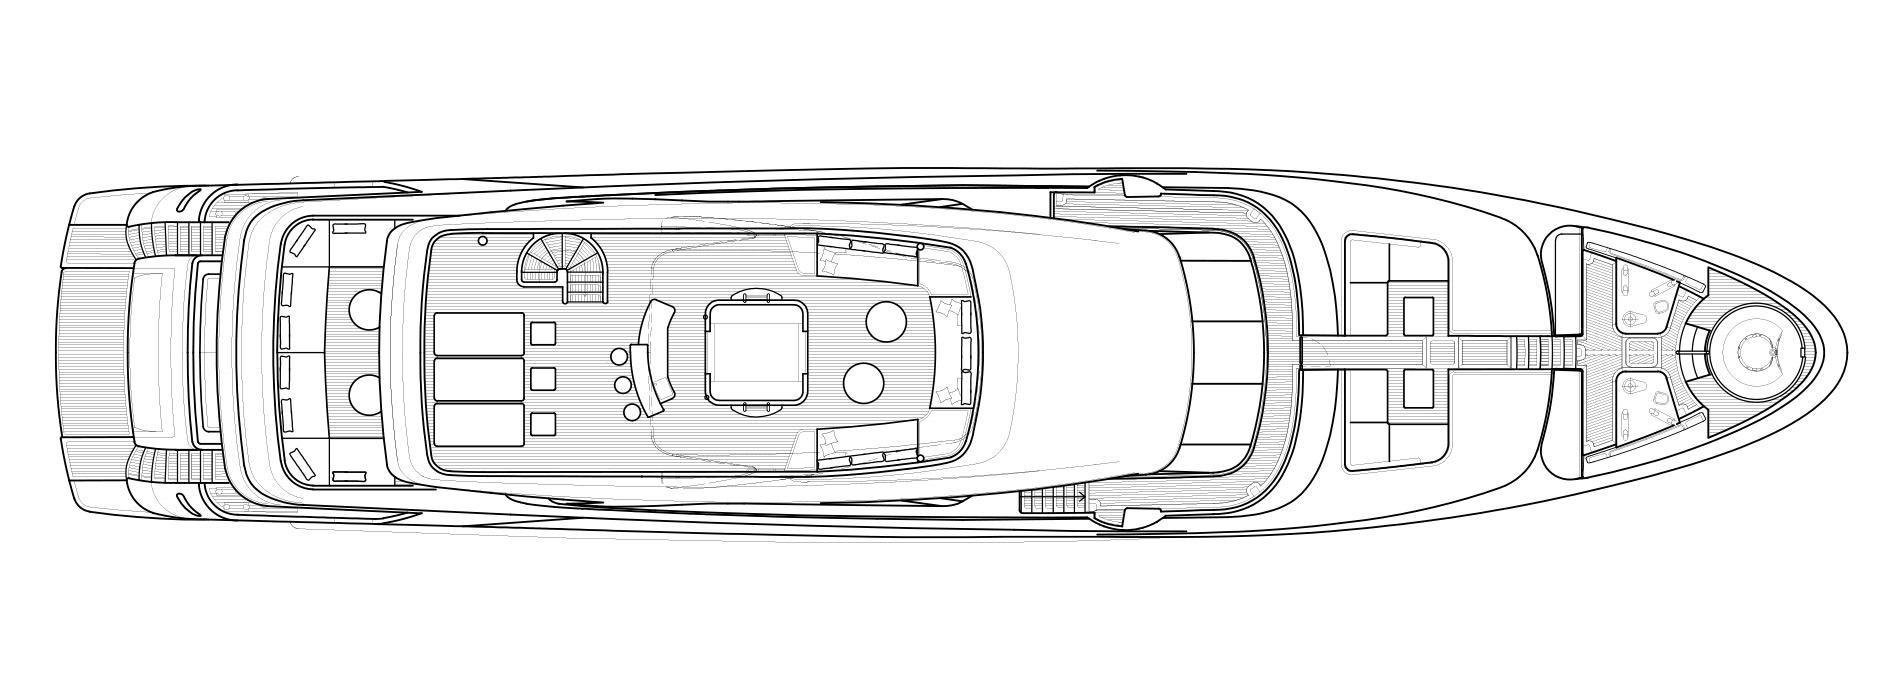 Sanlorenzo Yachts SD126 Флайбридж версия B